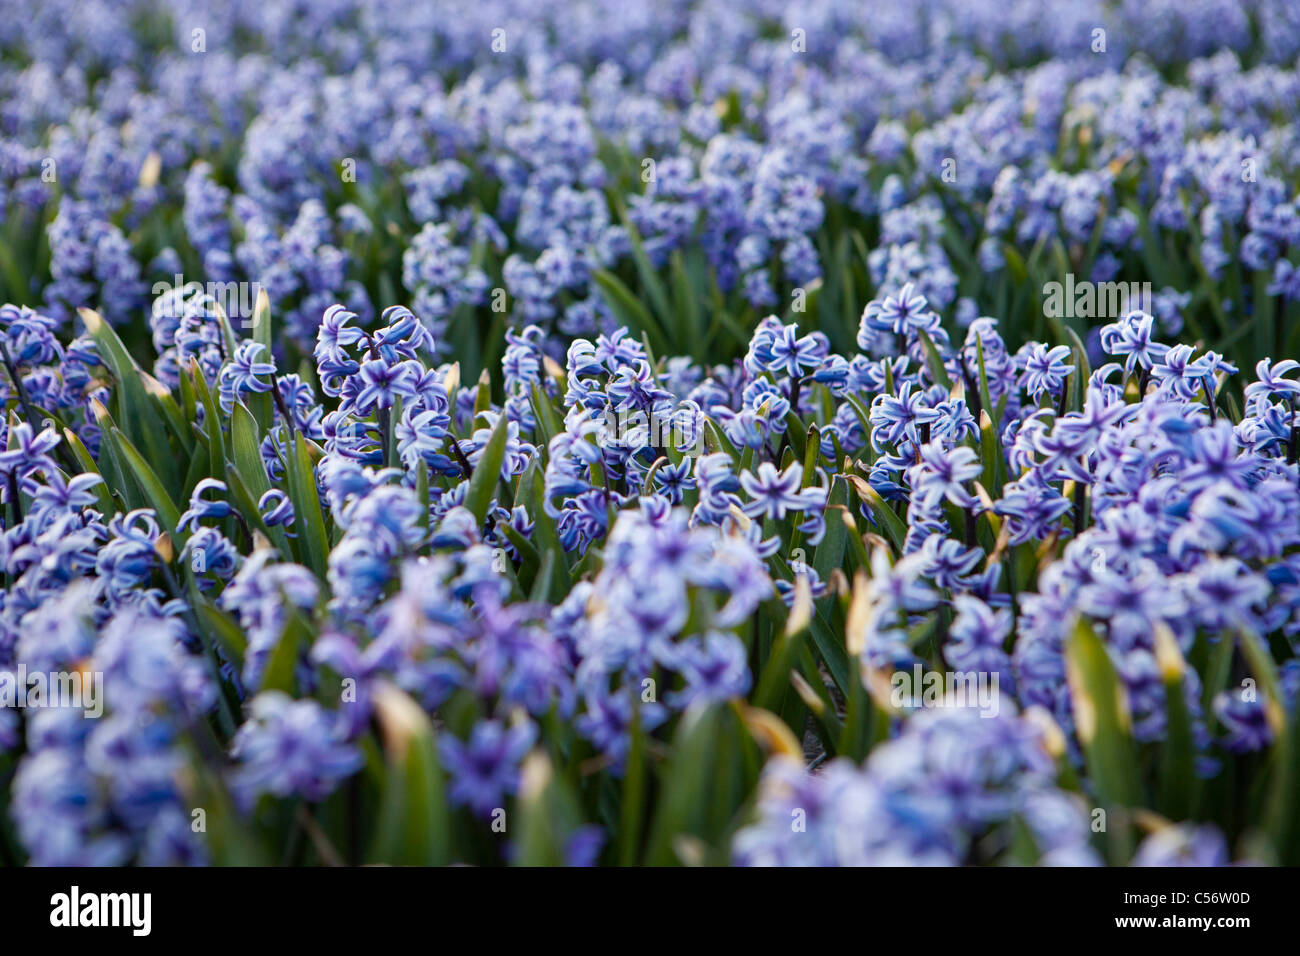 The Netherlands, Callantsoog, Flowering hyacinths. - Stock Image